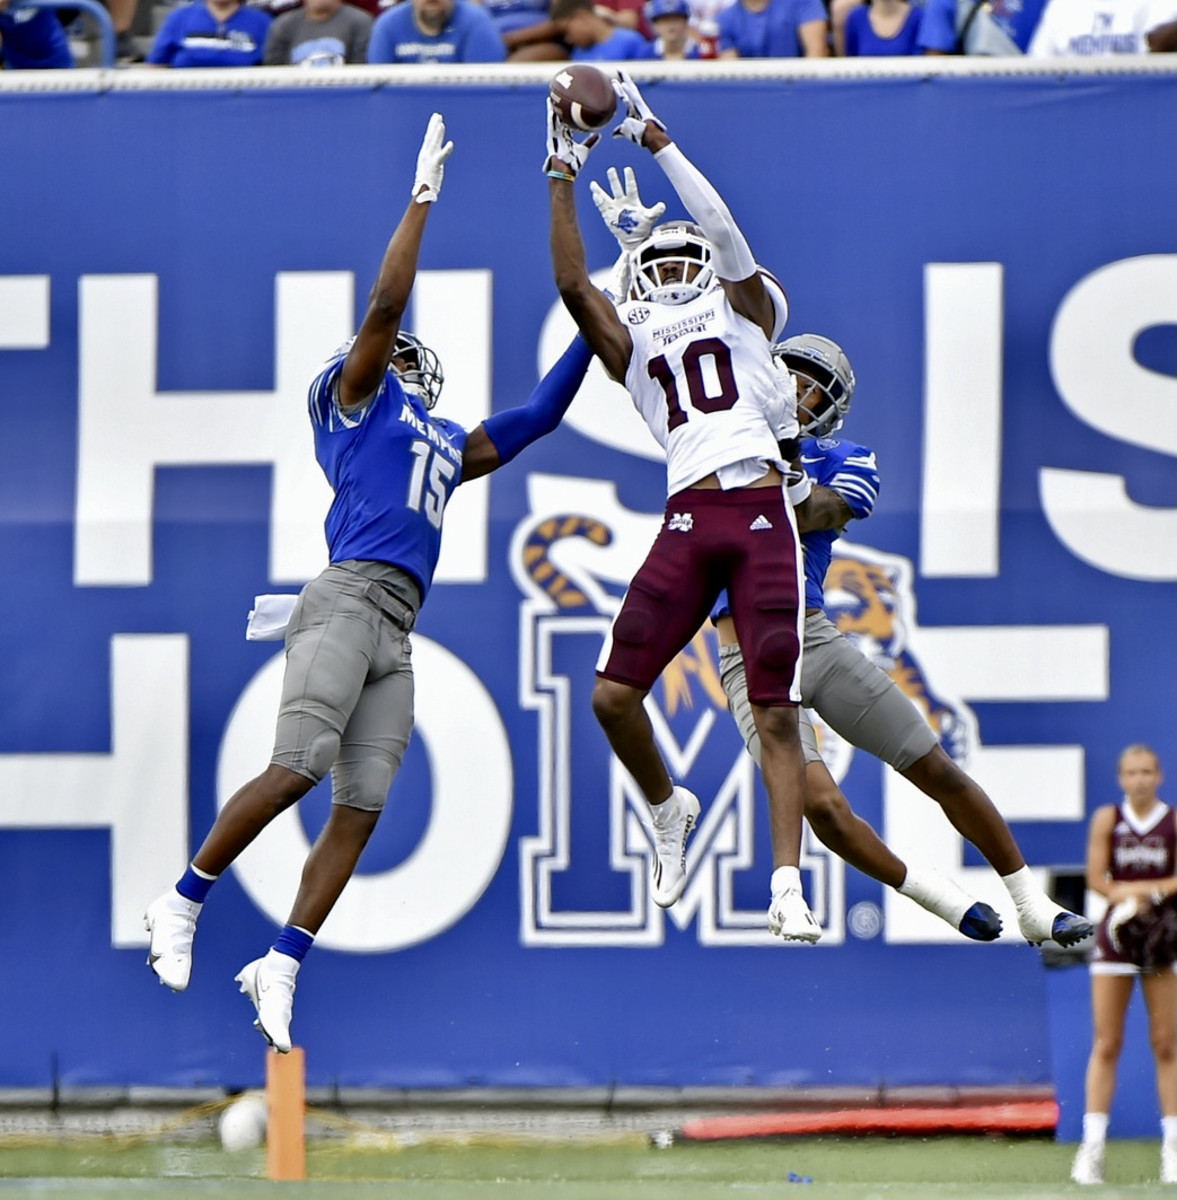 Makai Polk goes high to make a catch against Memphis